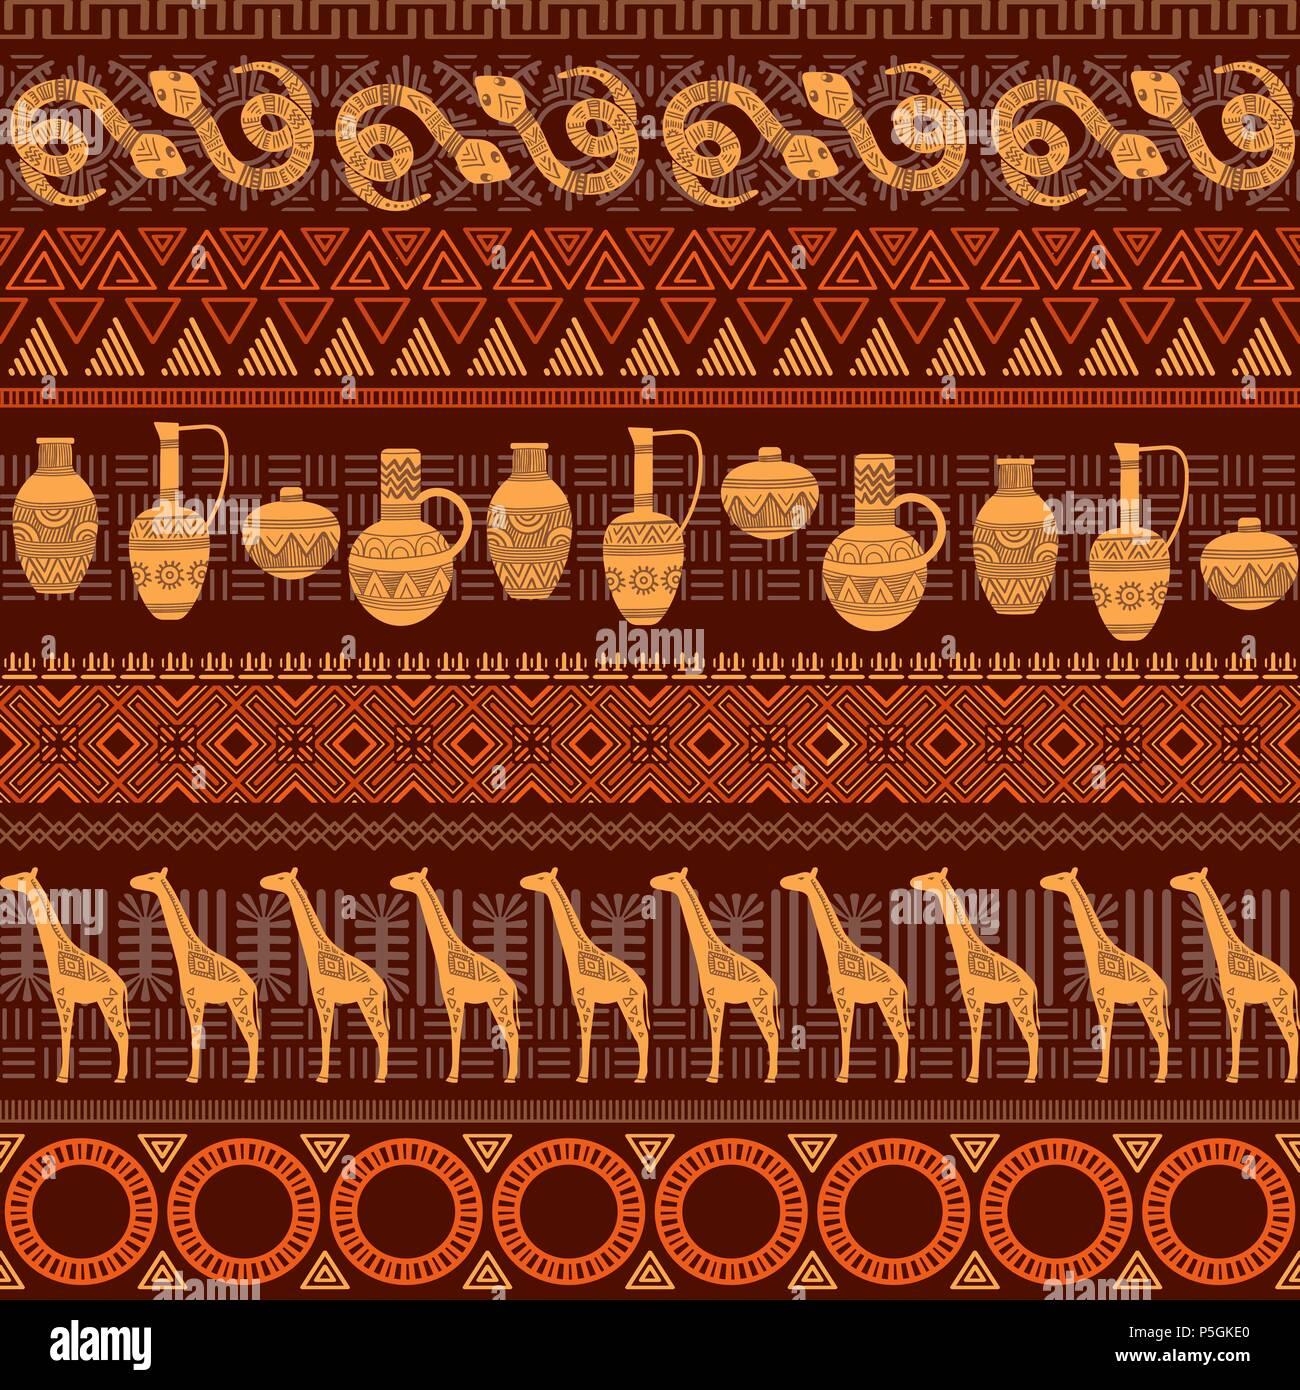 border design giraffe illustration stock photos  border